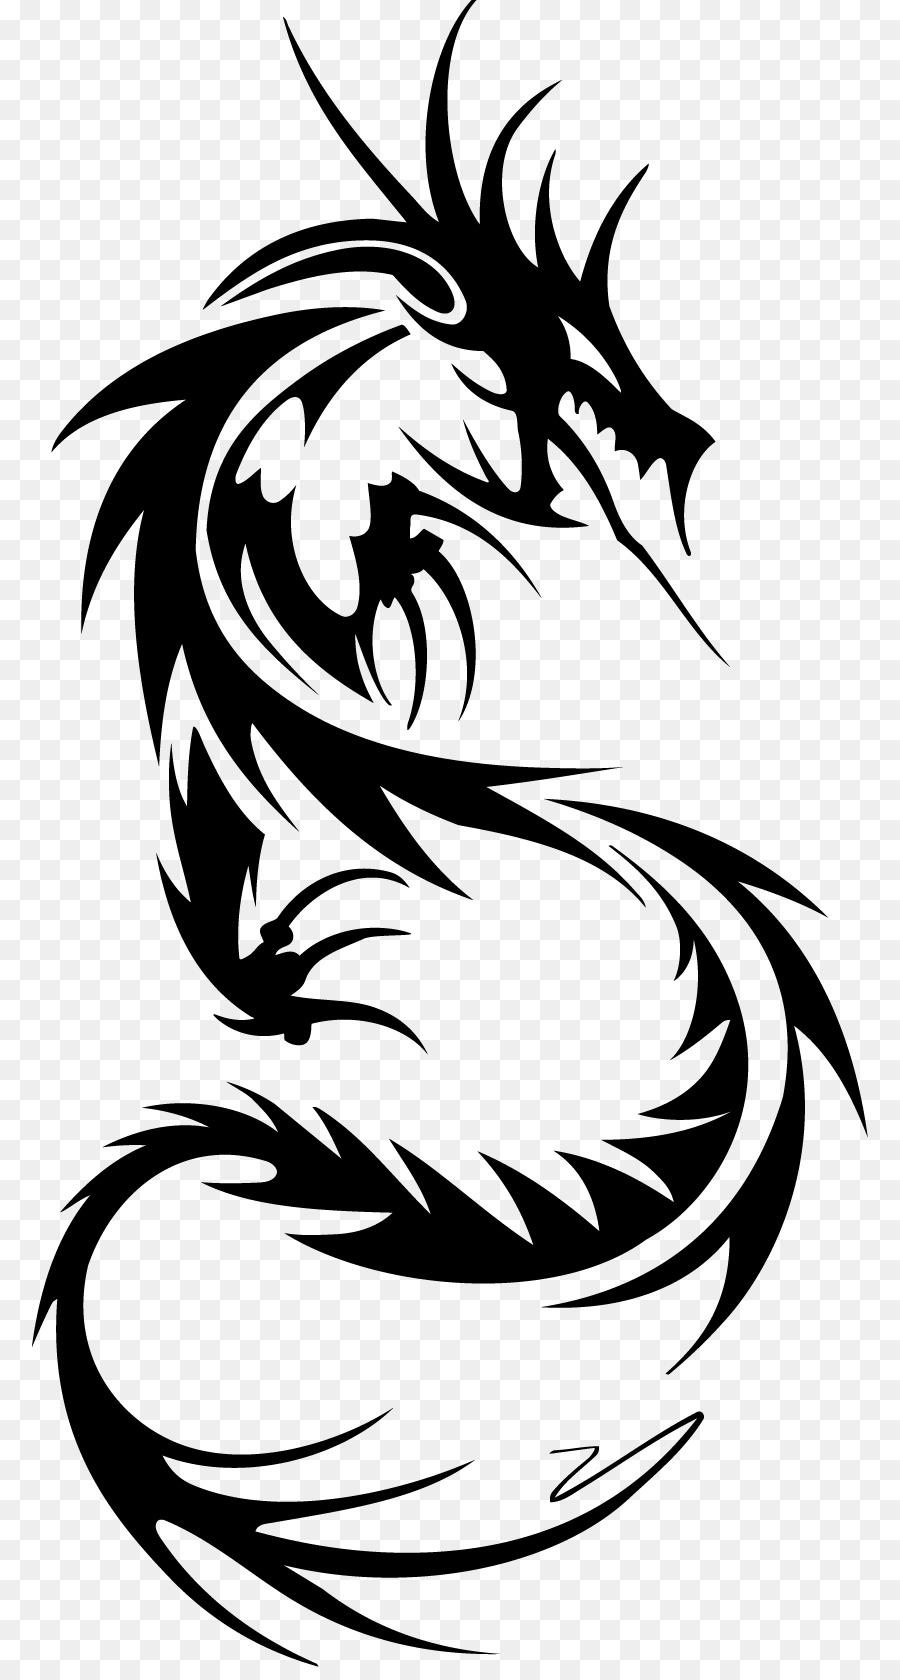 Sleeve Tattoo Tribe Nautical Star Dragon Dragon Png Download 836